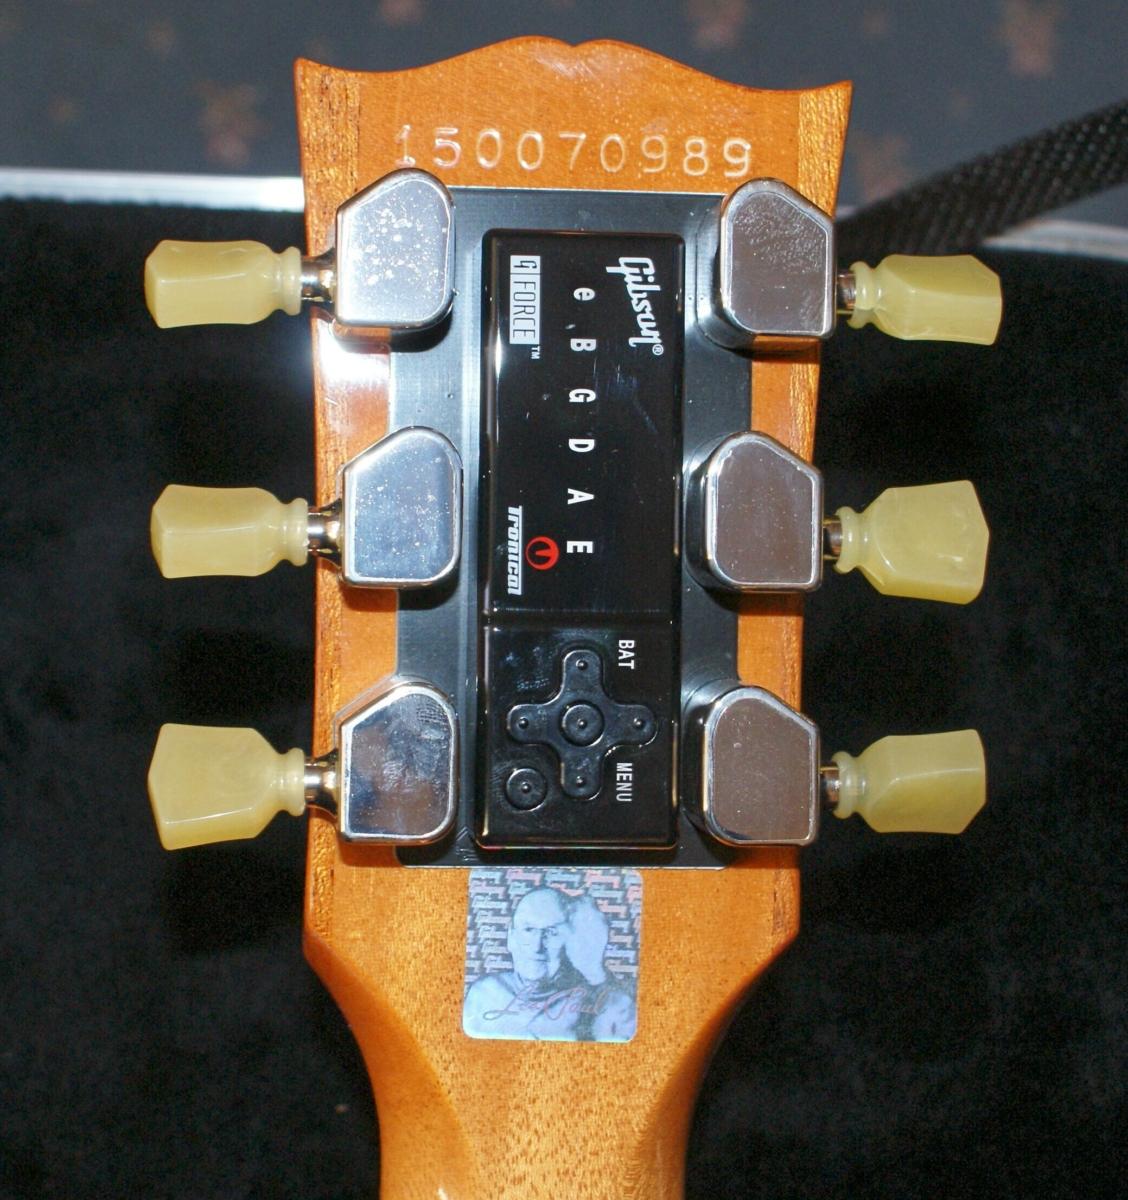 Mint Condition 2015 Gibson Les Paul Classic In Seafoam Green Ohc Plus Electric Guitar Vintage Sunburst The